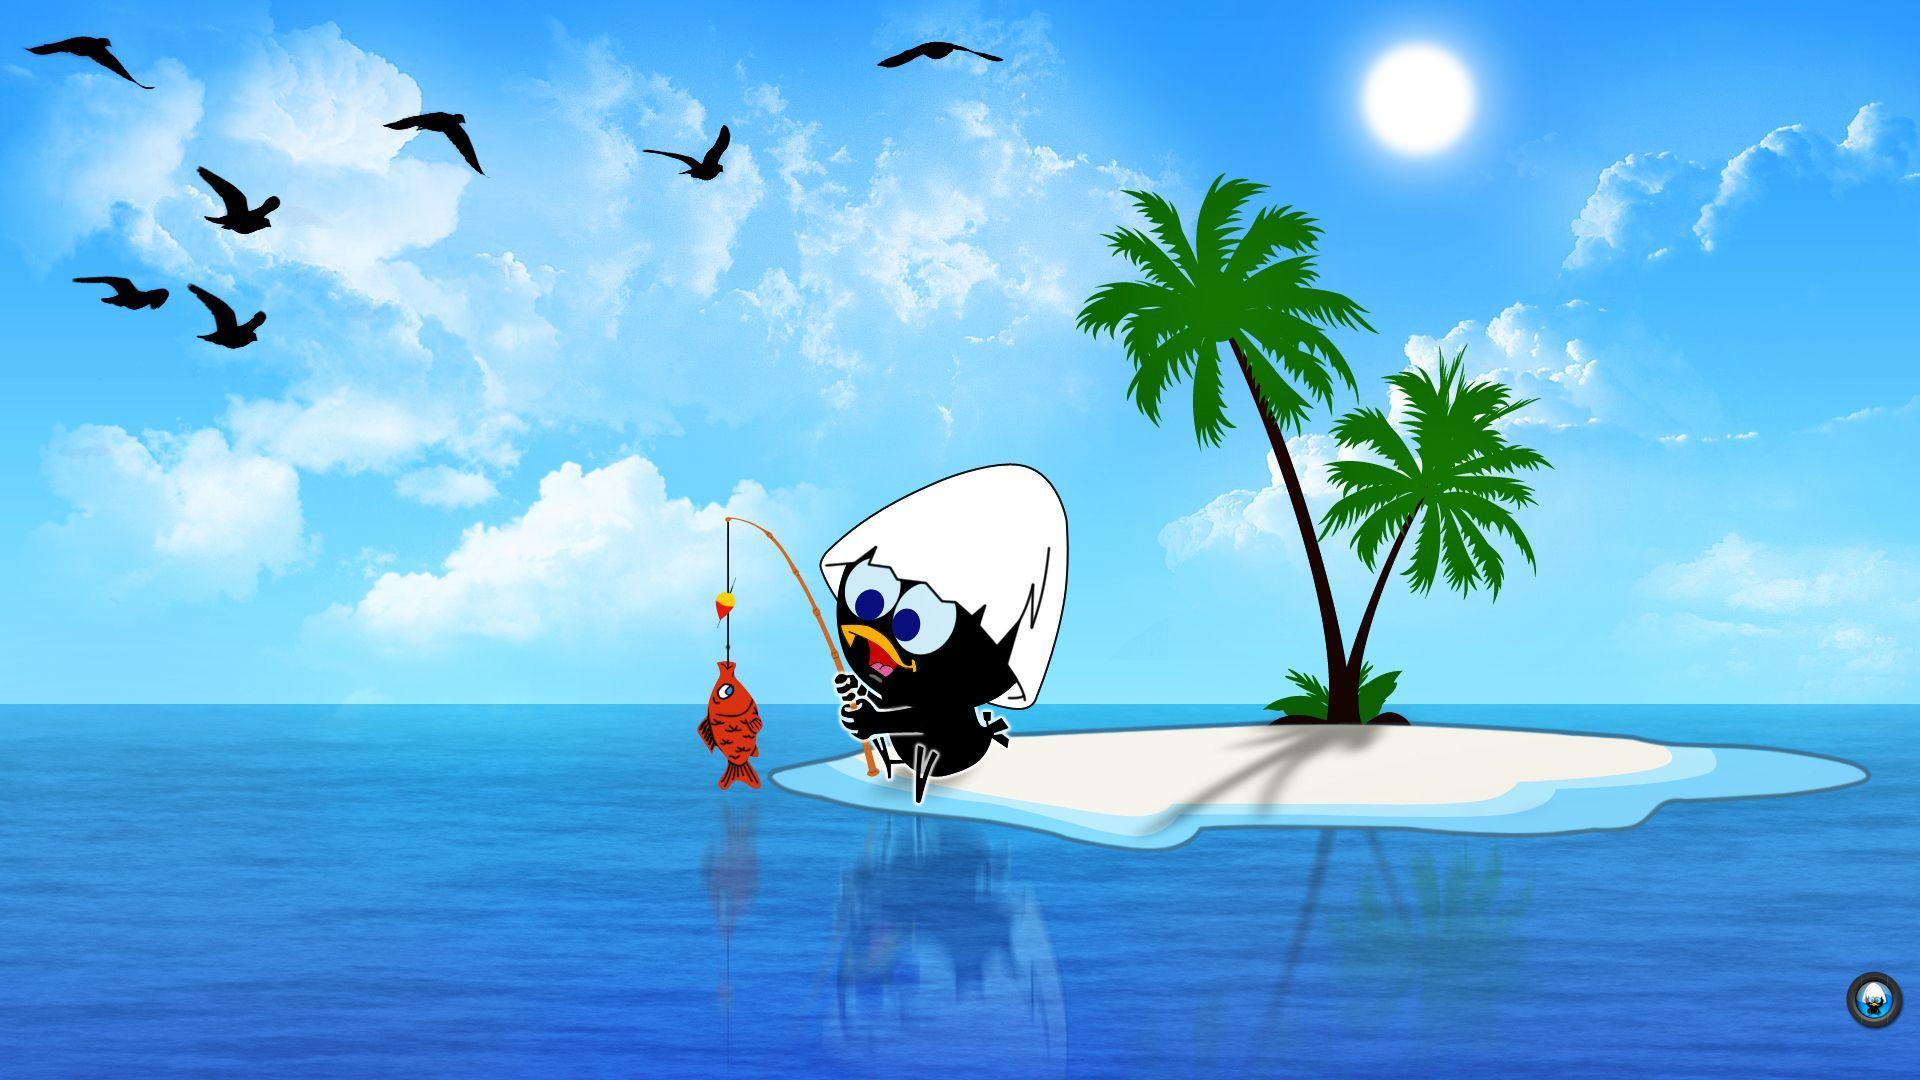 Hd Cartoon Wallpapers Top Free Hd Cartoon Backgrounds